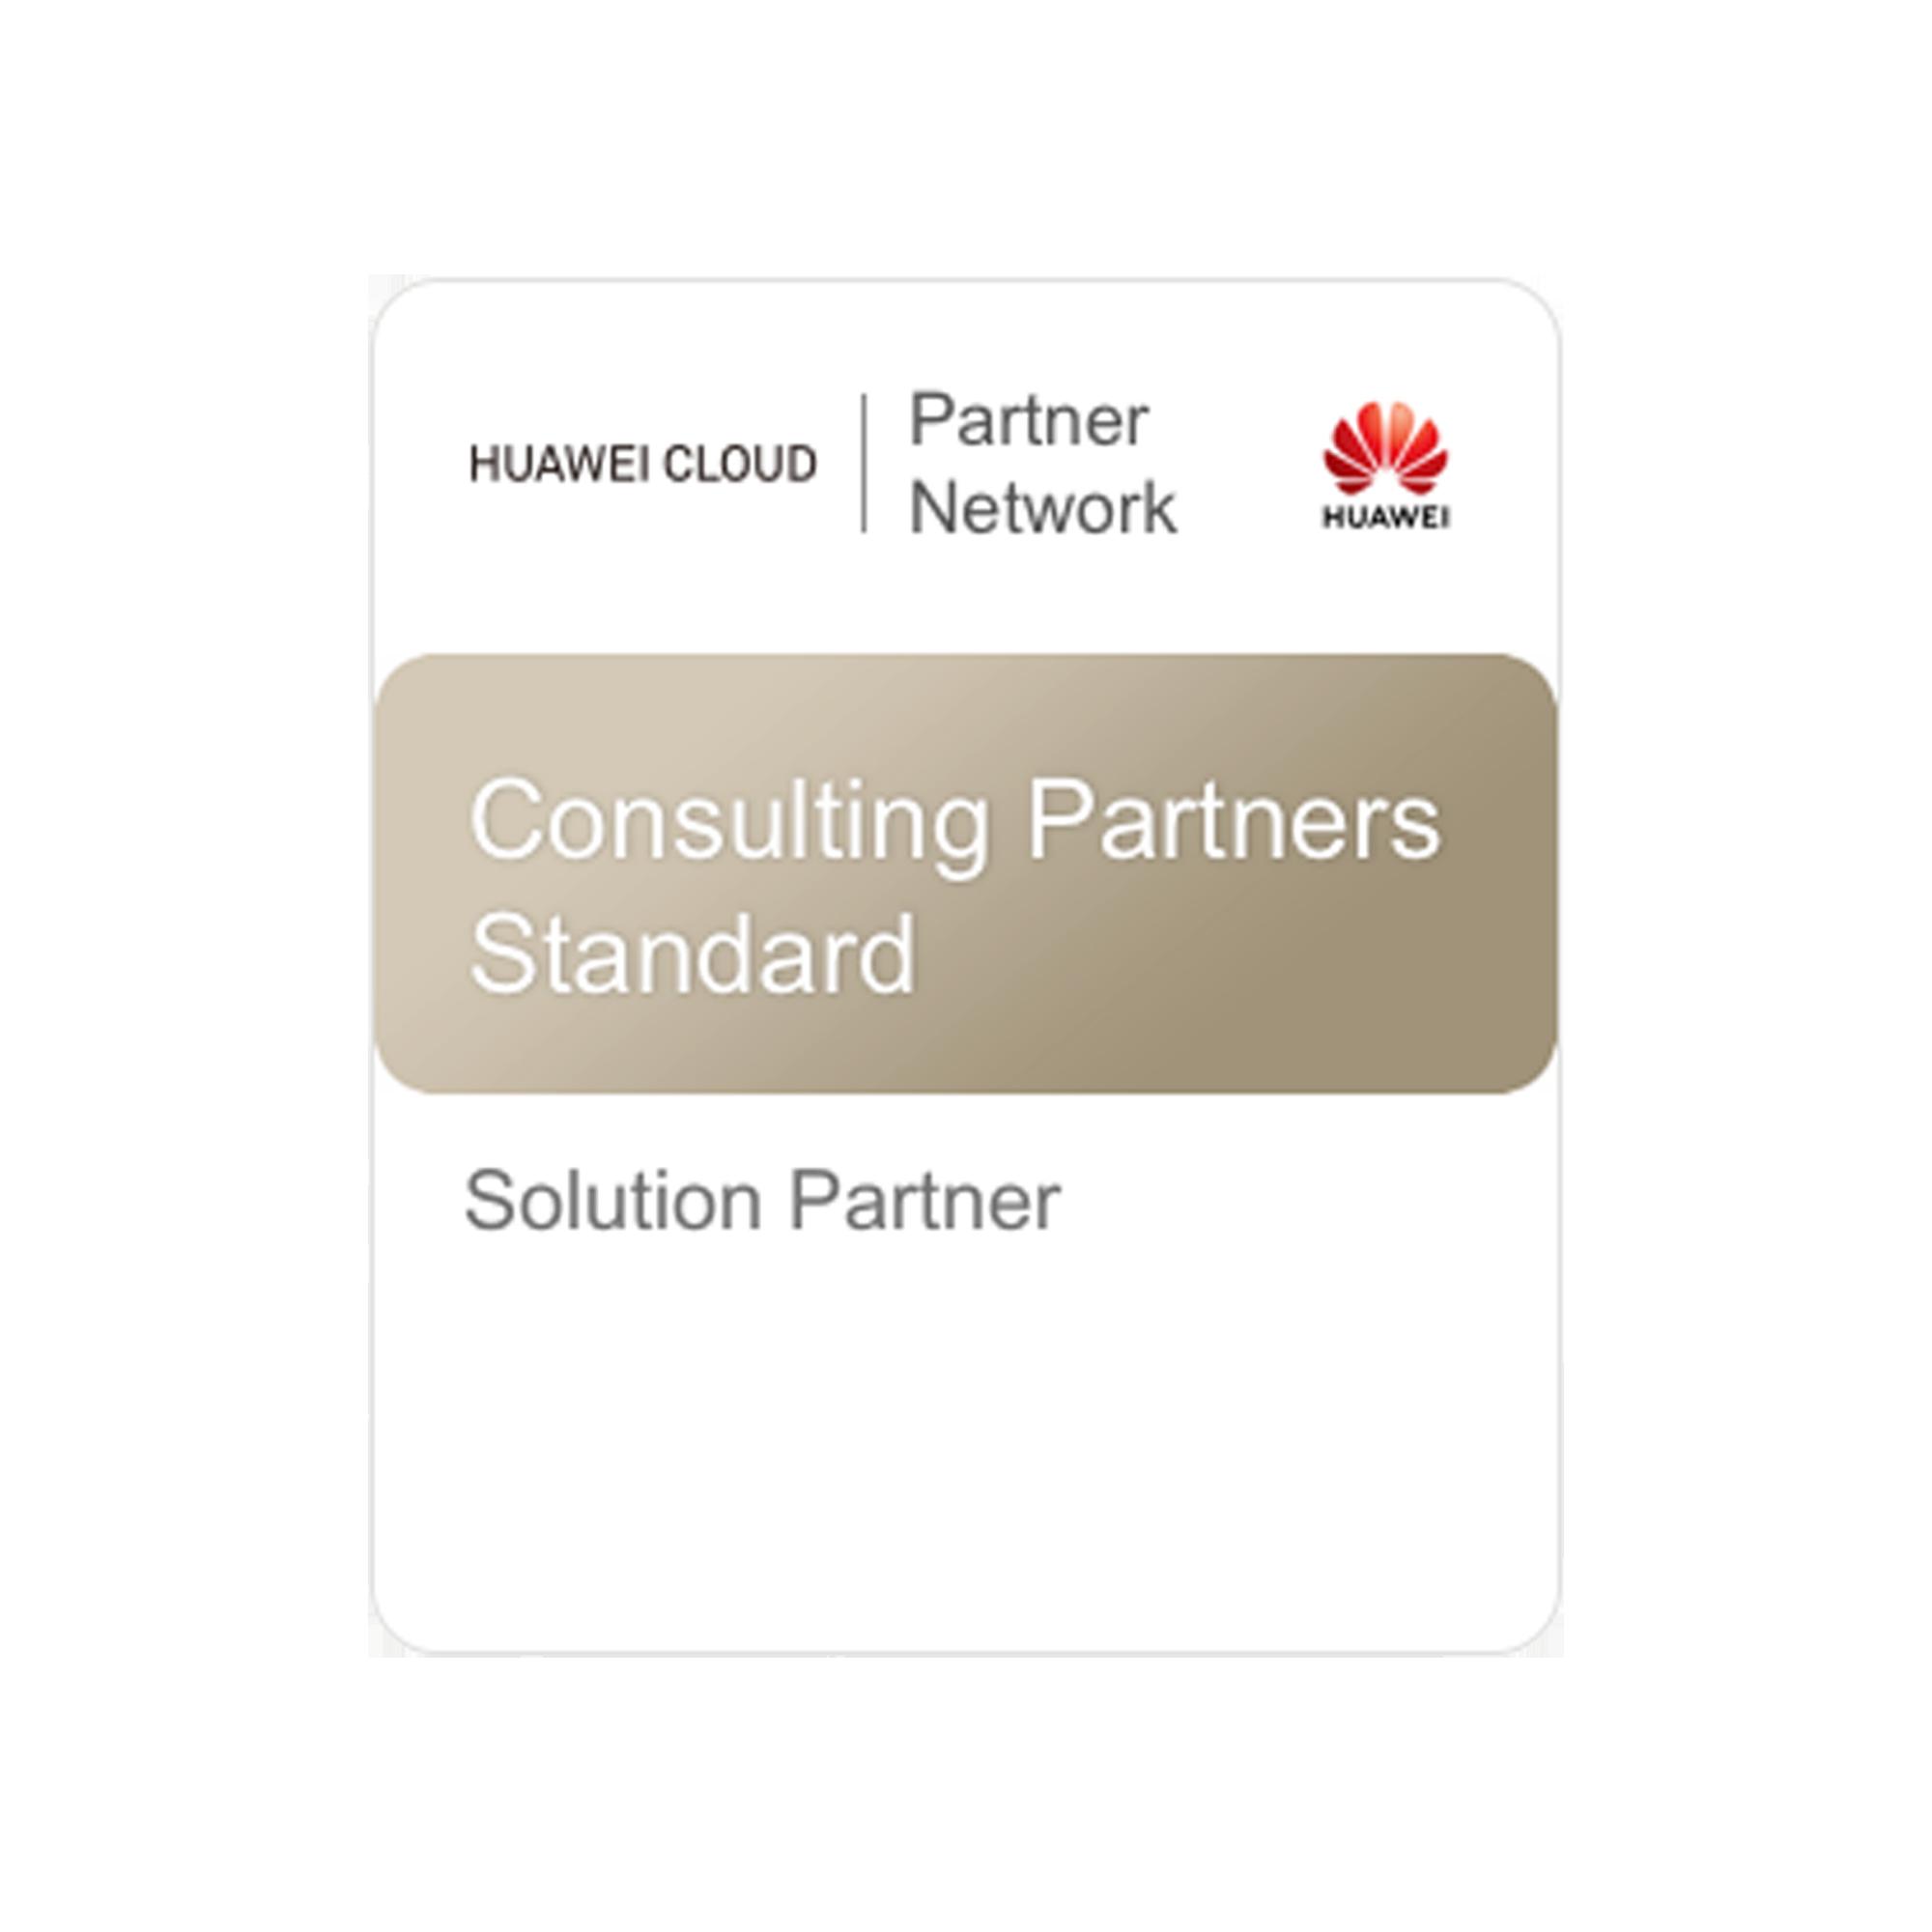 Huaweii Cloud Partnership